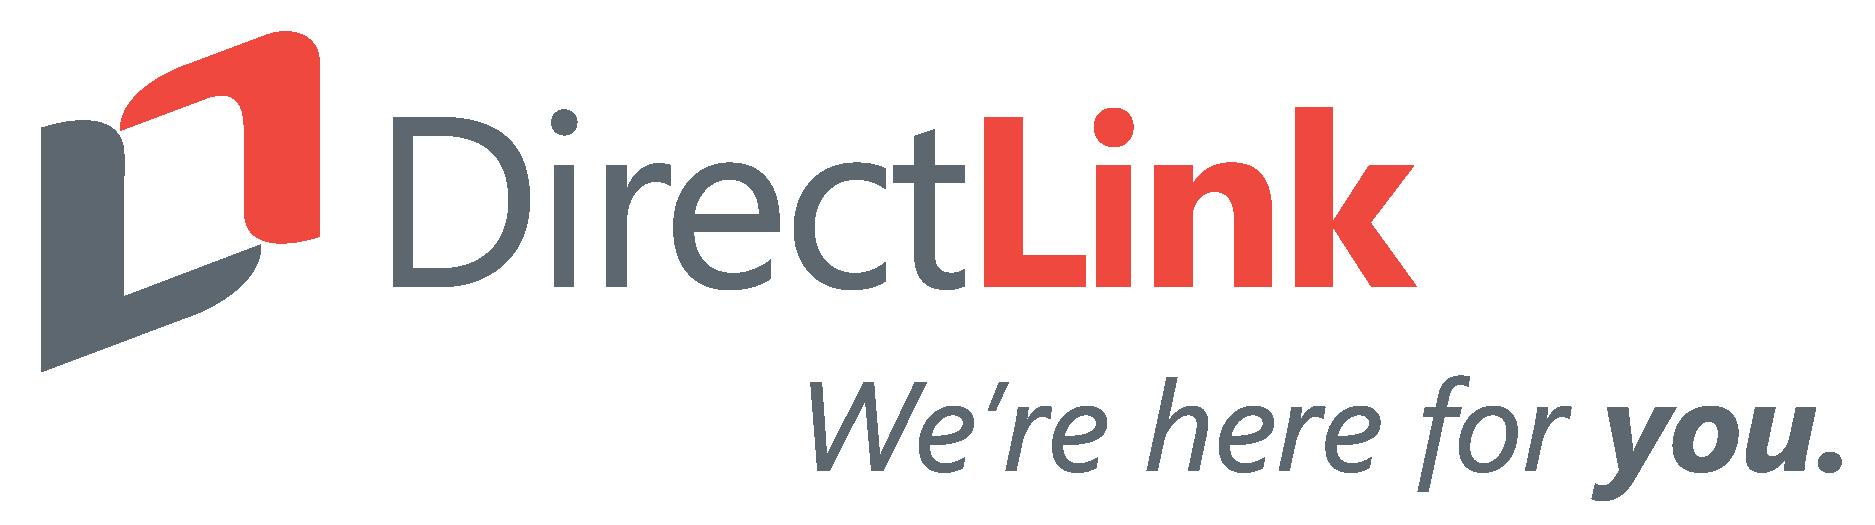 directlink-logo-wtagline-rgb-lrg-300dpi